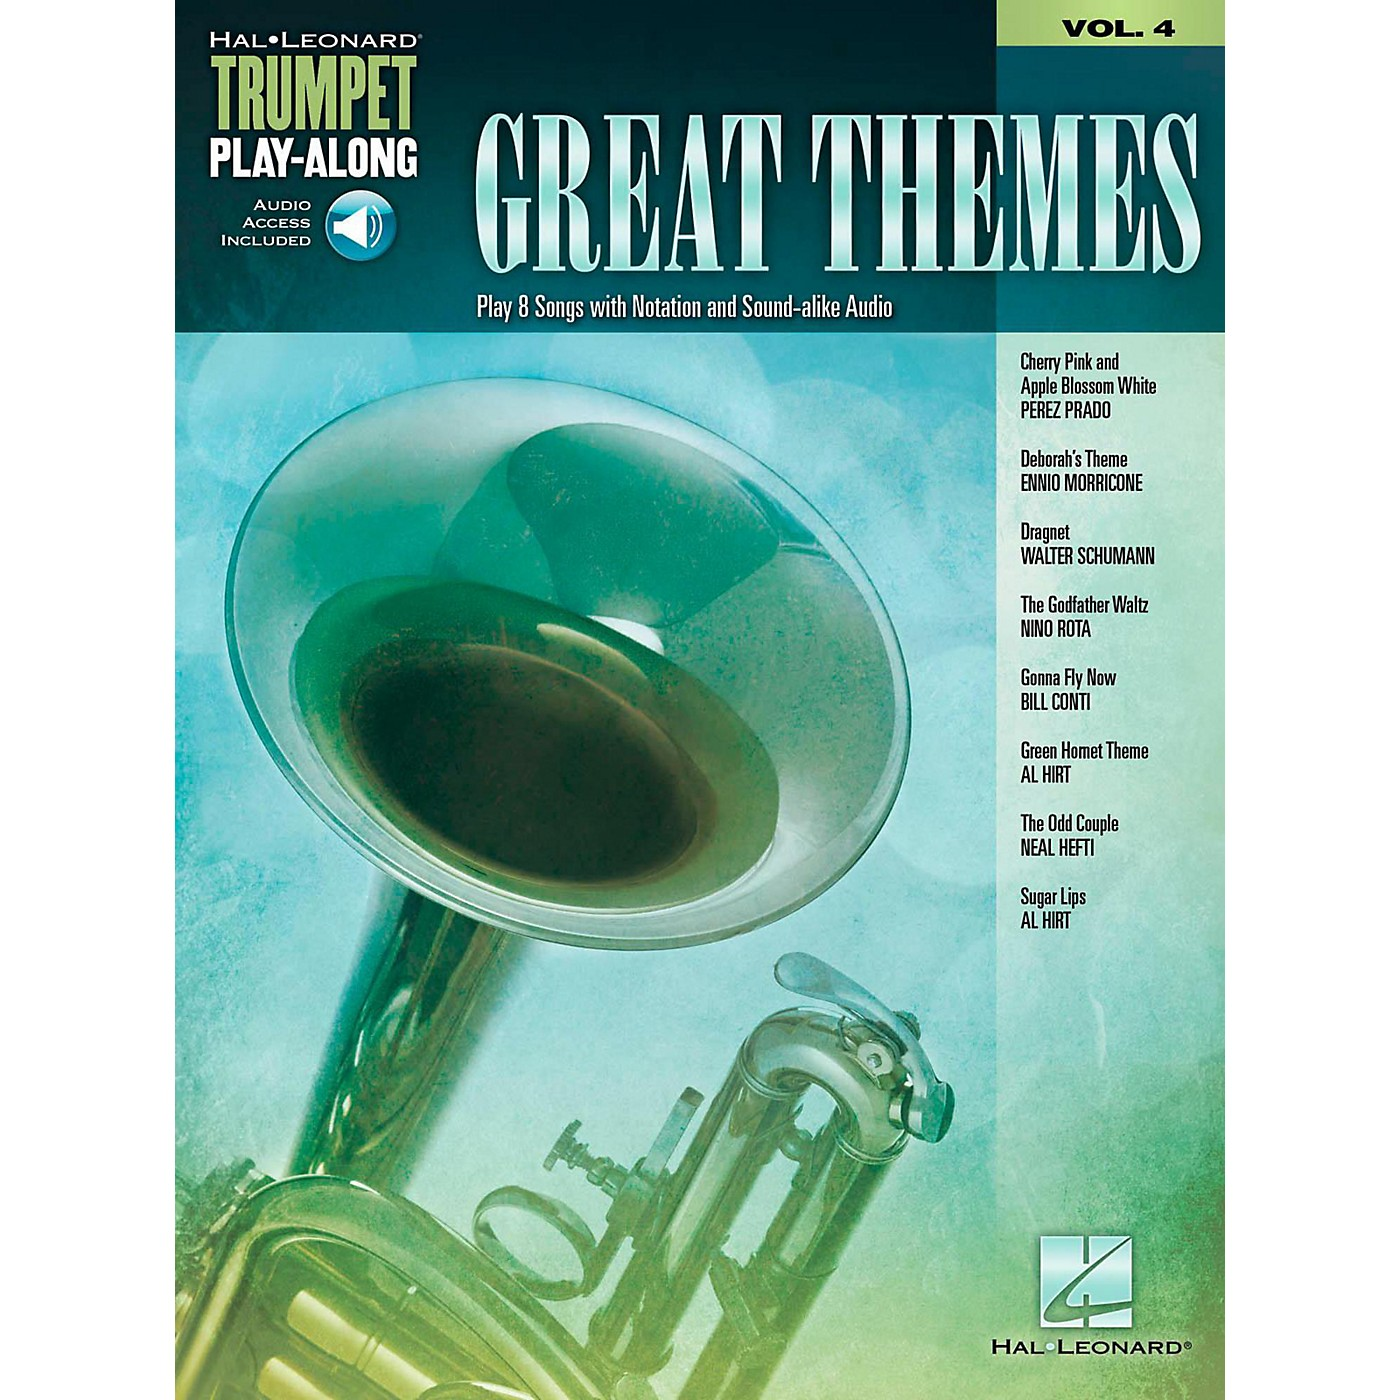 Hal Leonard Great Themes - Trumpet Play-Along Vol. 4 (Book/Audio Online) thumbnail